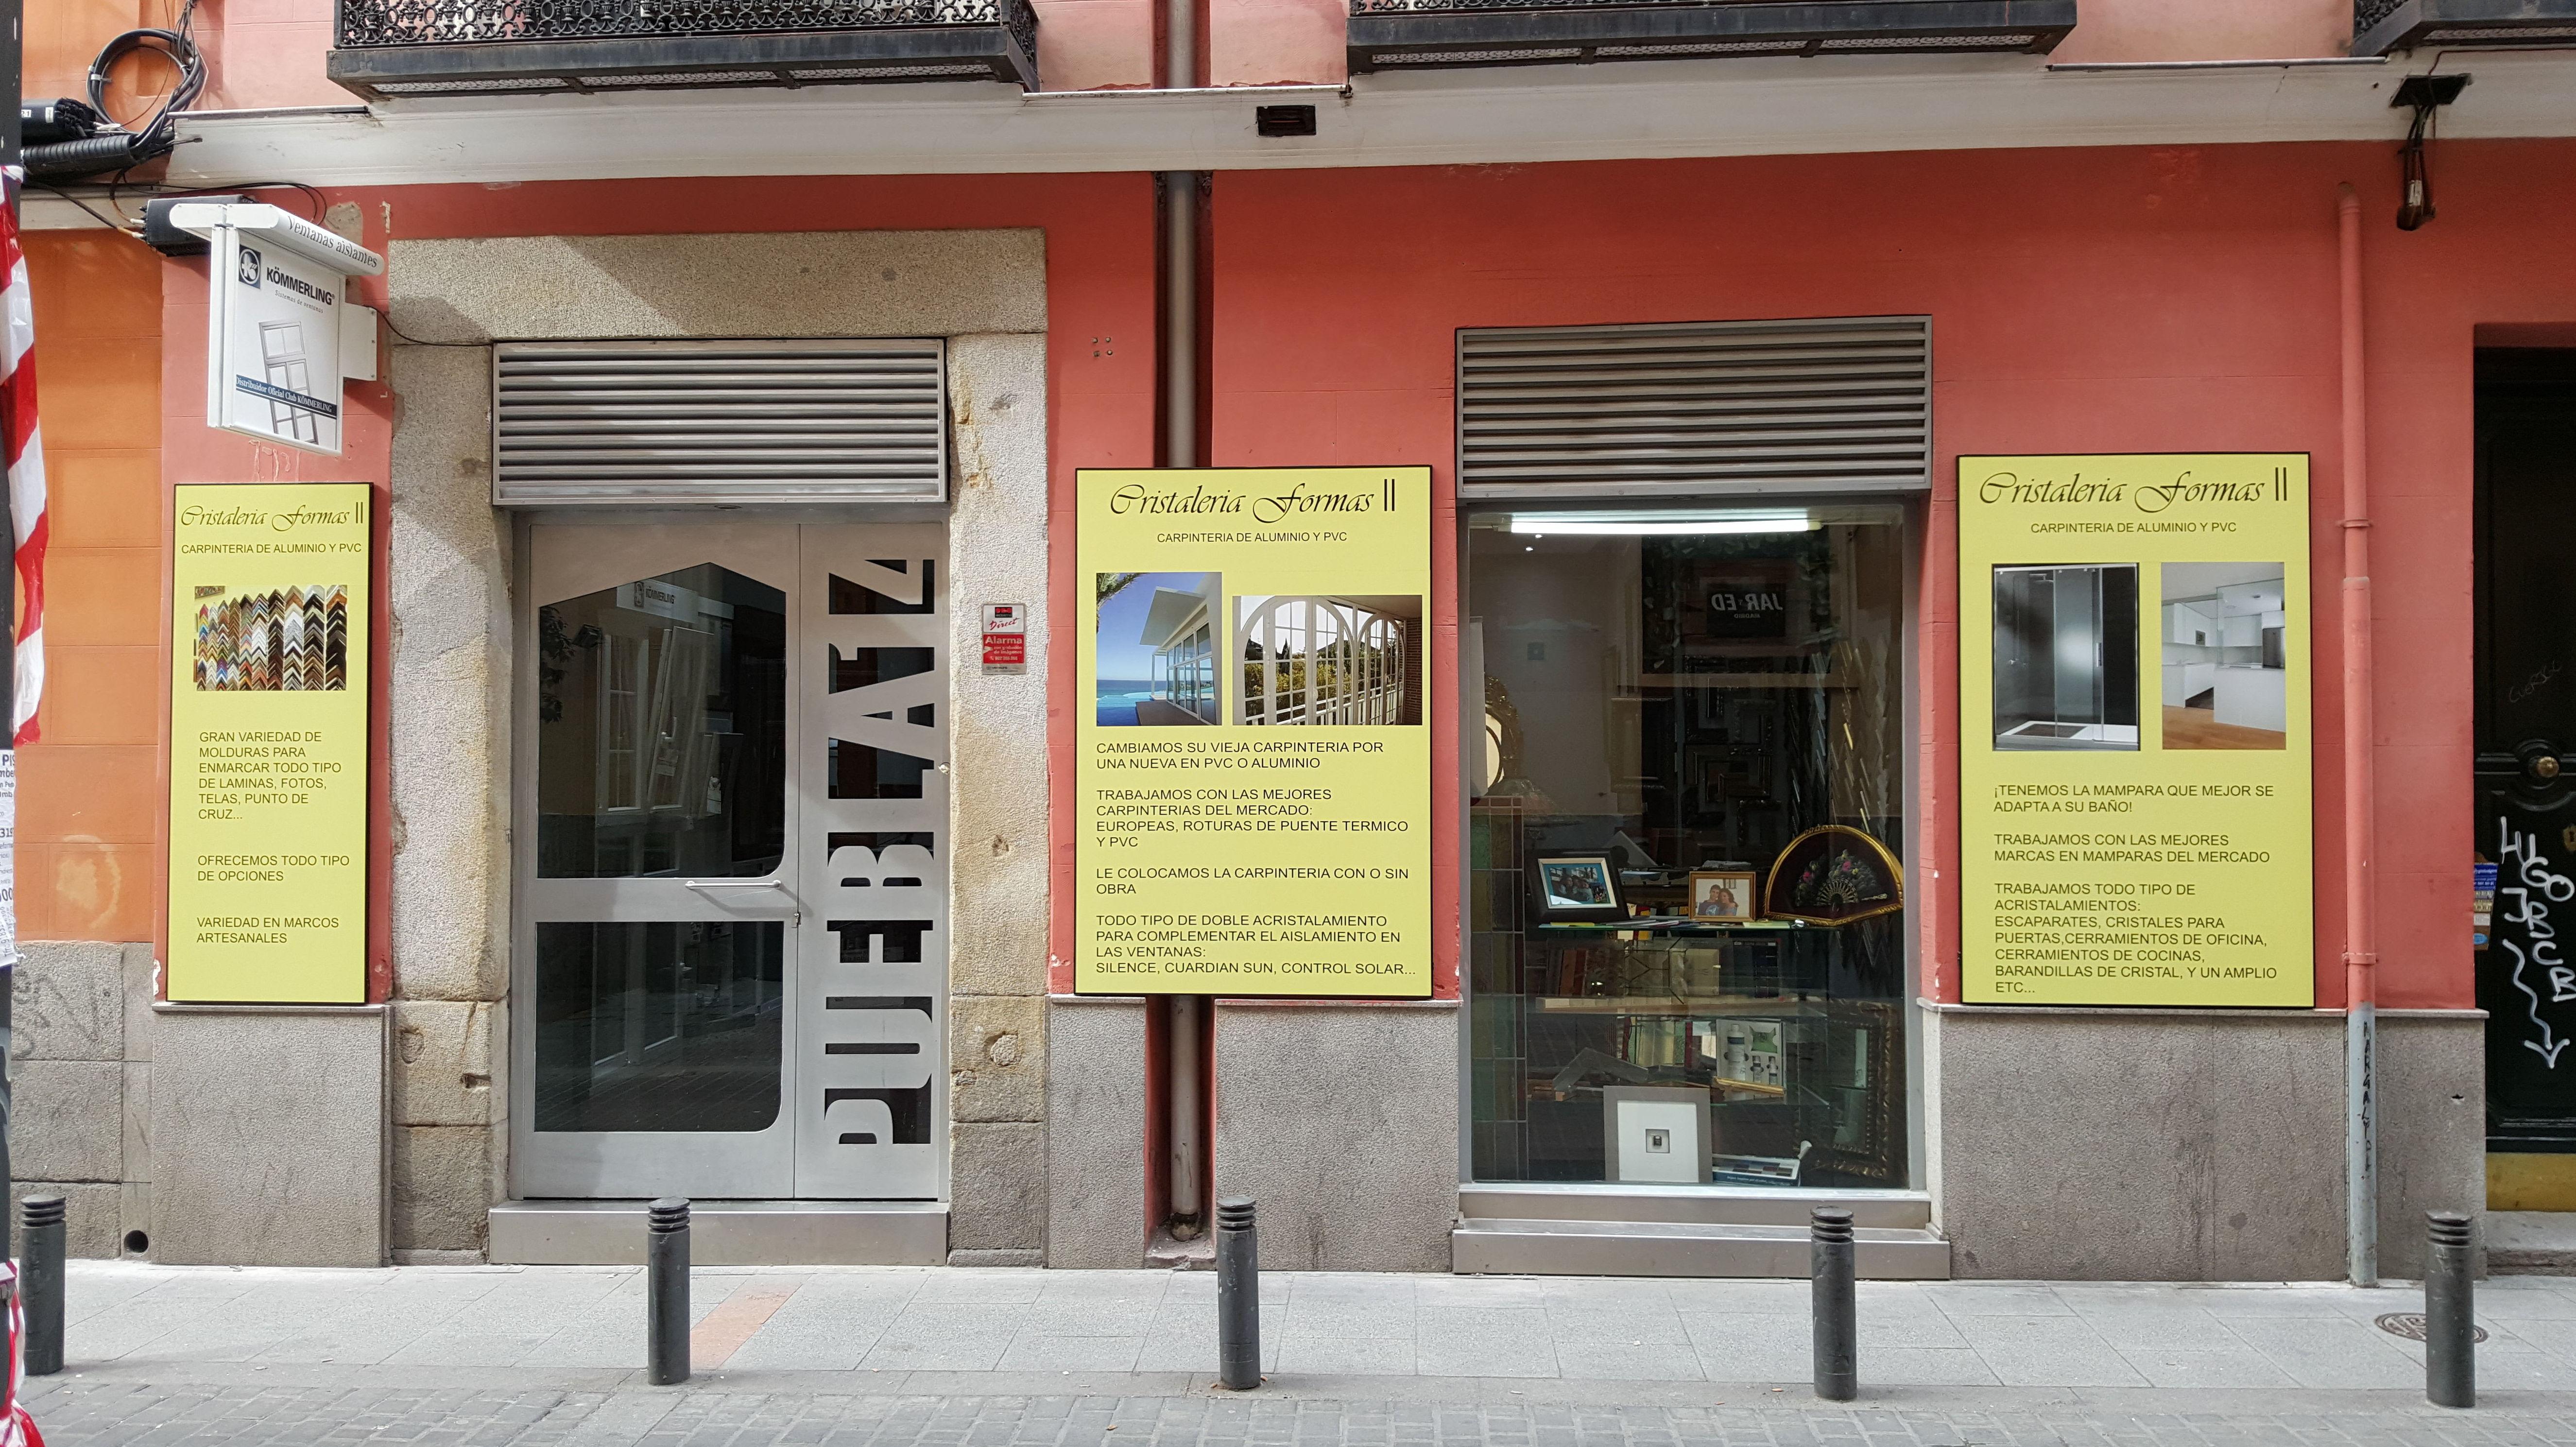 CRISTALERIA FORMAS II C/ PUEBLA, 14 28004 MADRID